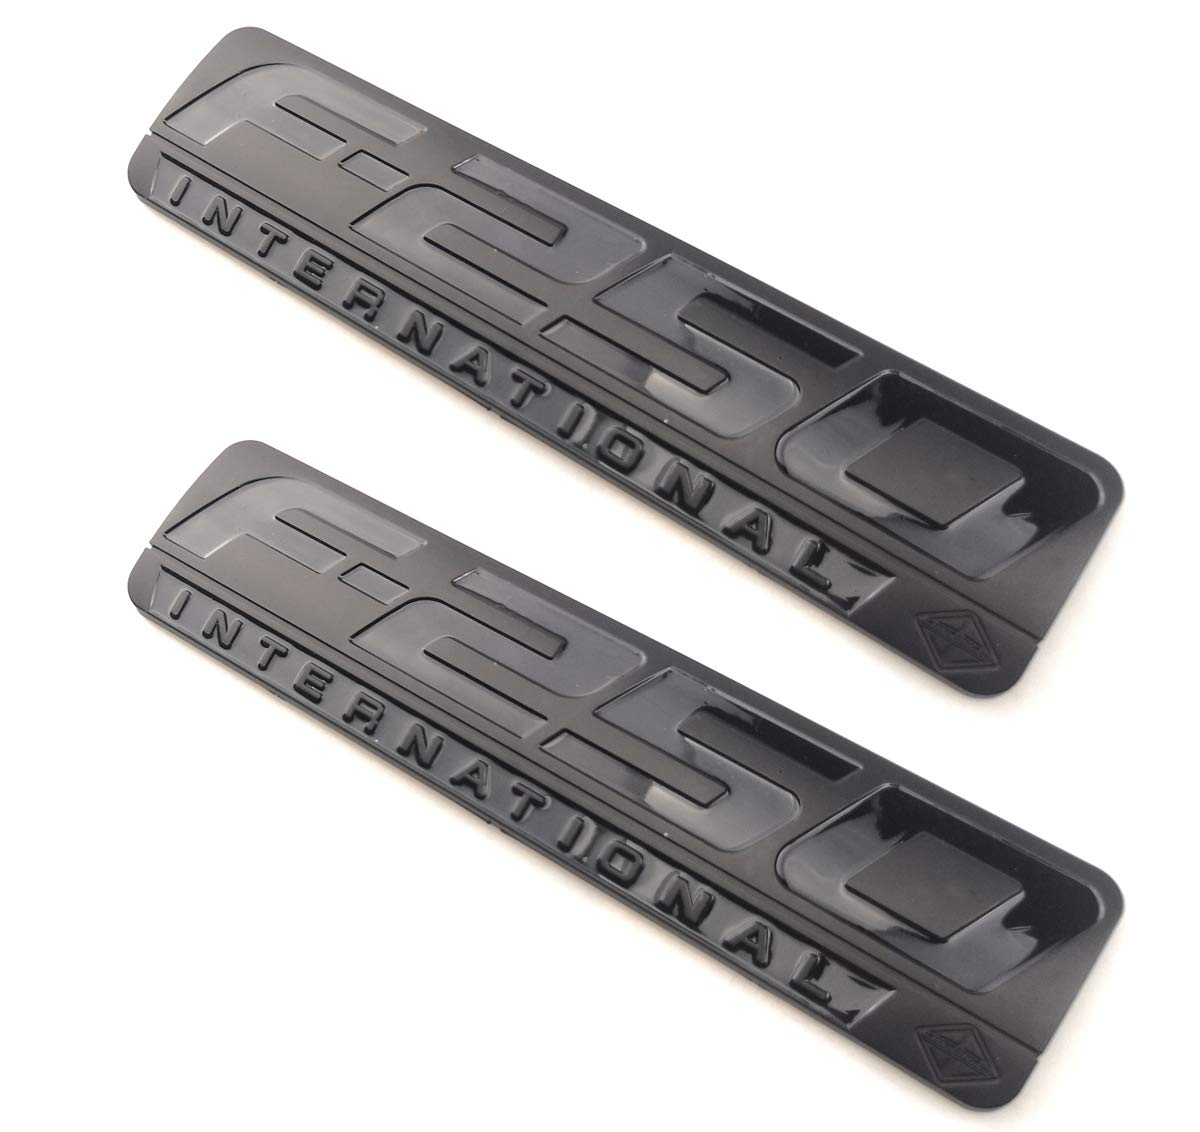 2PCS F-250 INTERNATIONAL Side Fender Emblem 3D Nameplate Badge Logo Decal Replacement for F250 Black